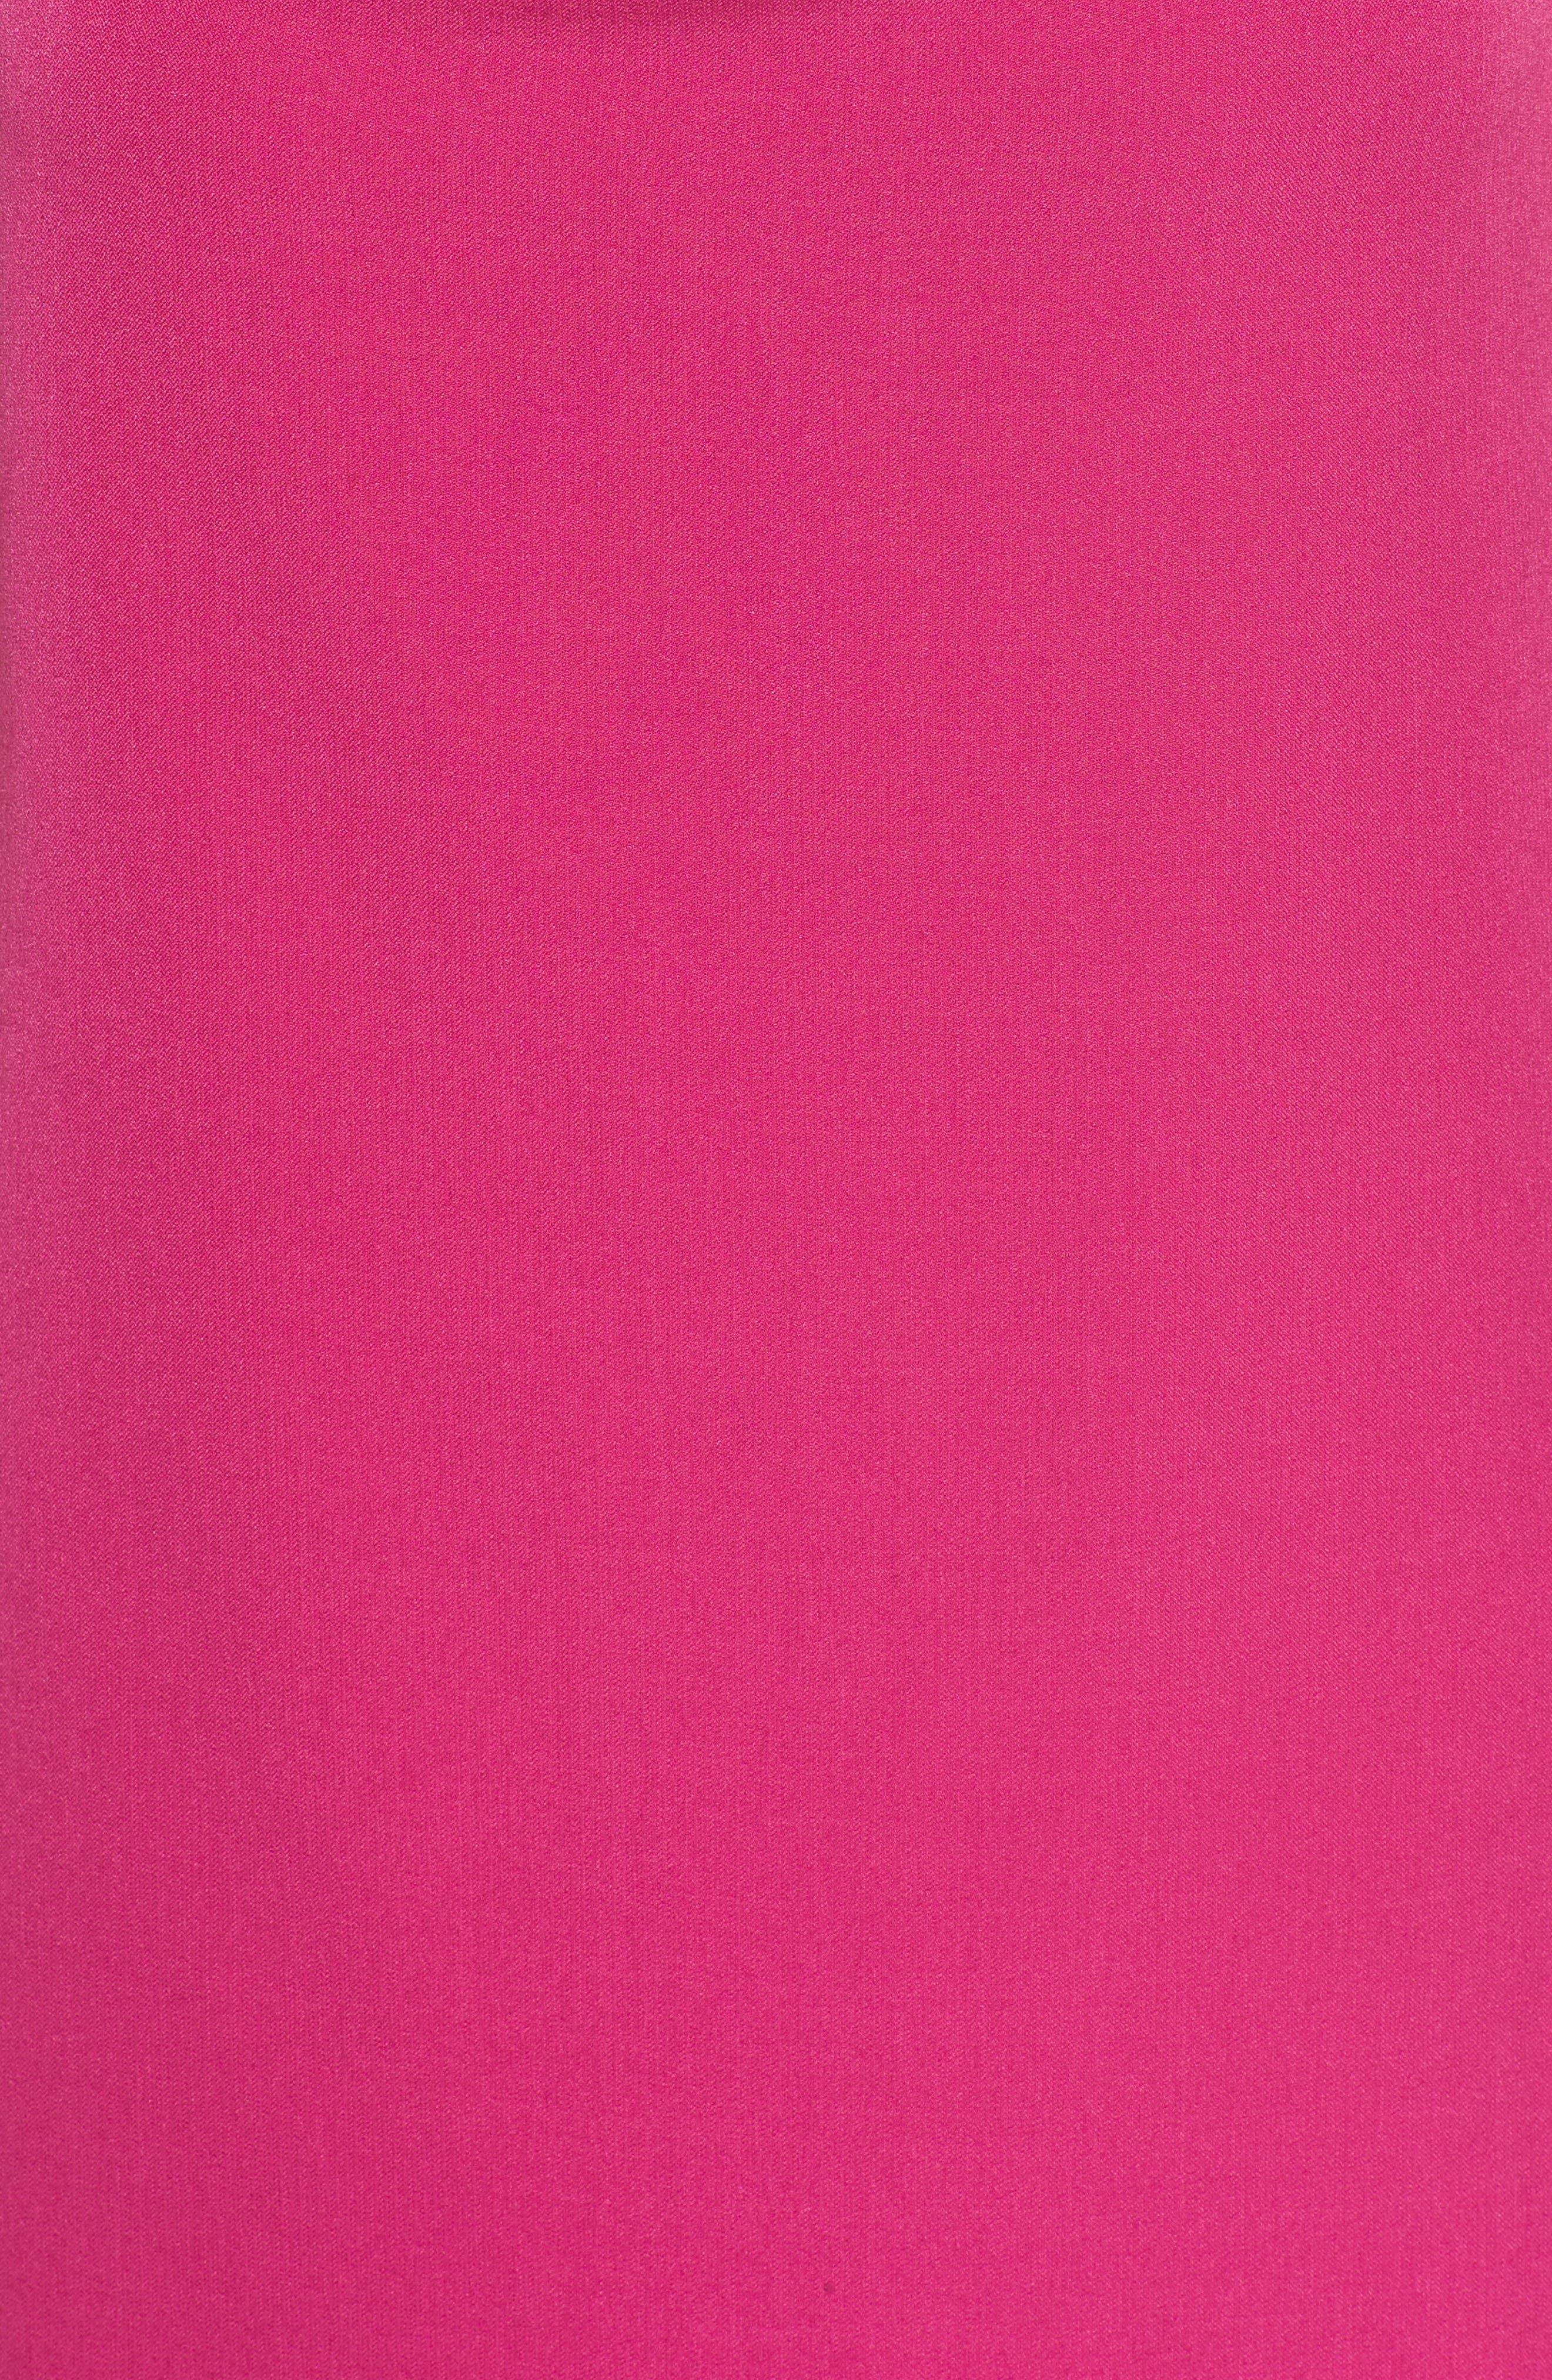 Cowl Neck Sheath Dress,                             Alternate thumbnail 10, color,